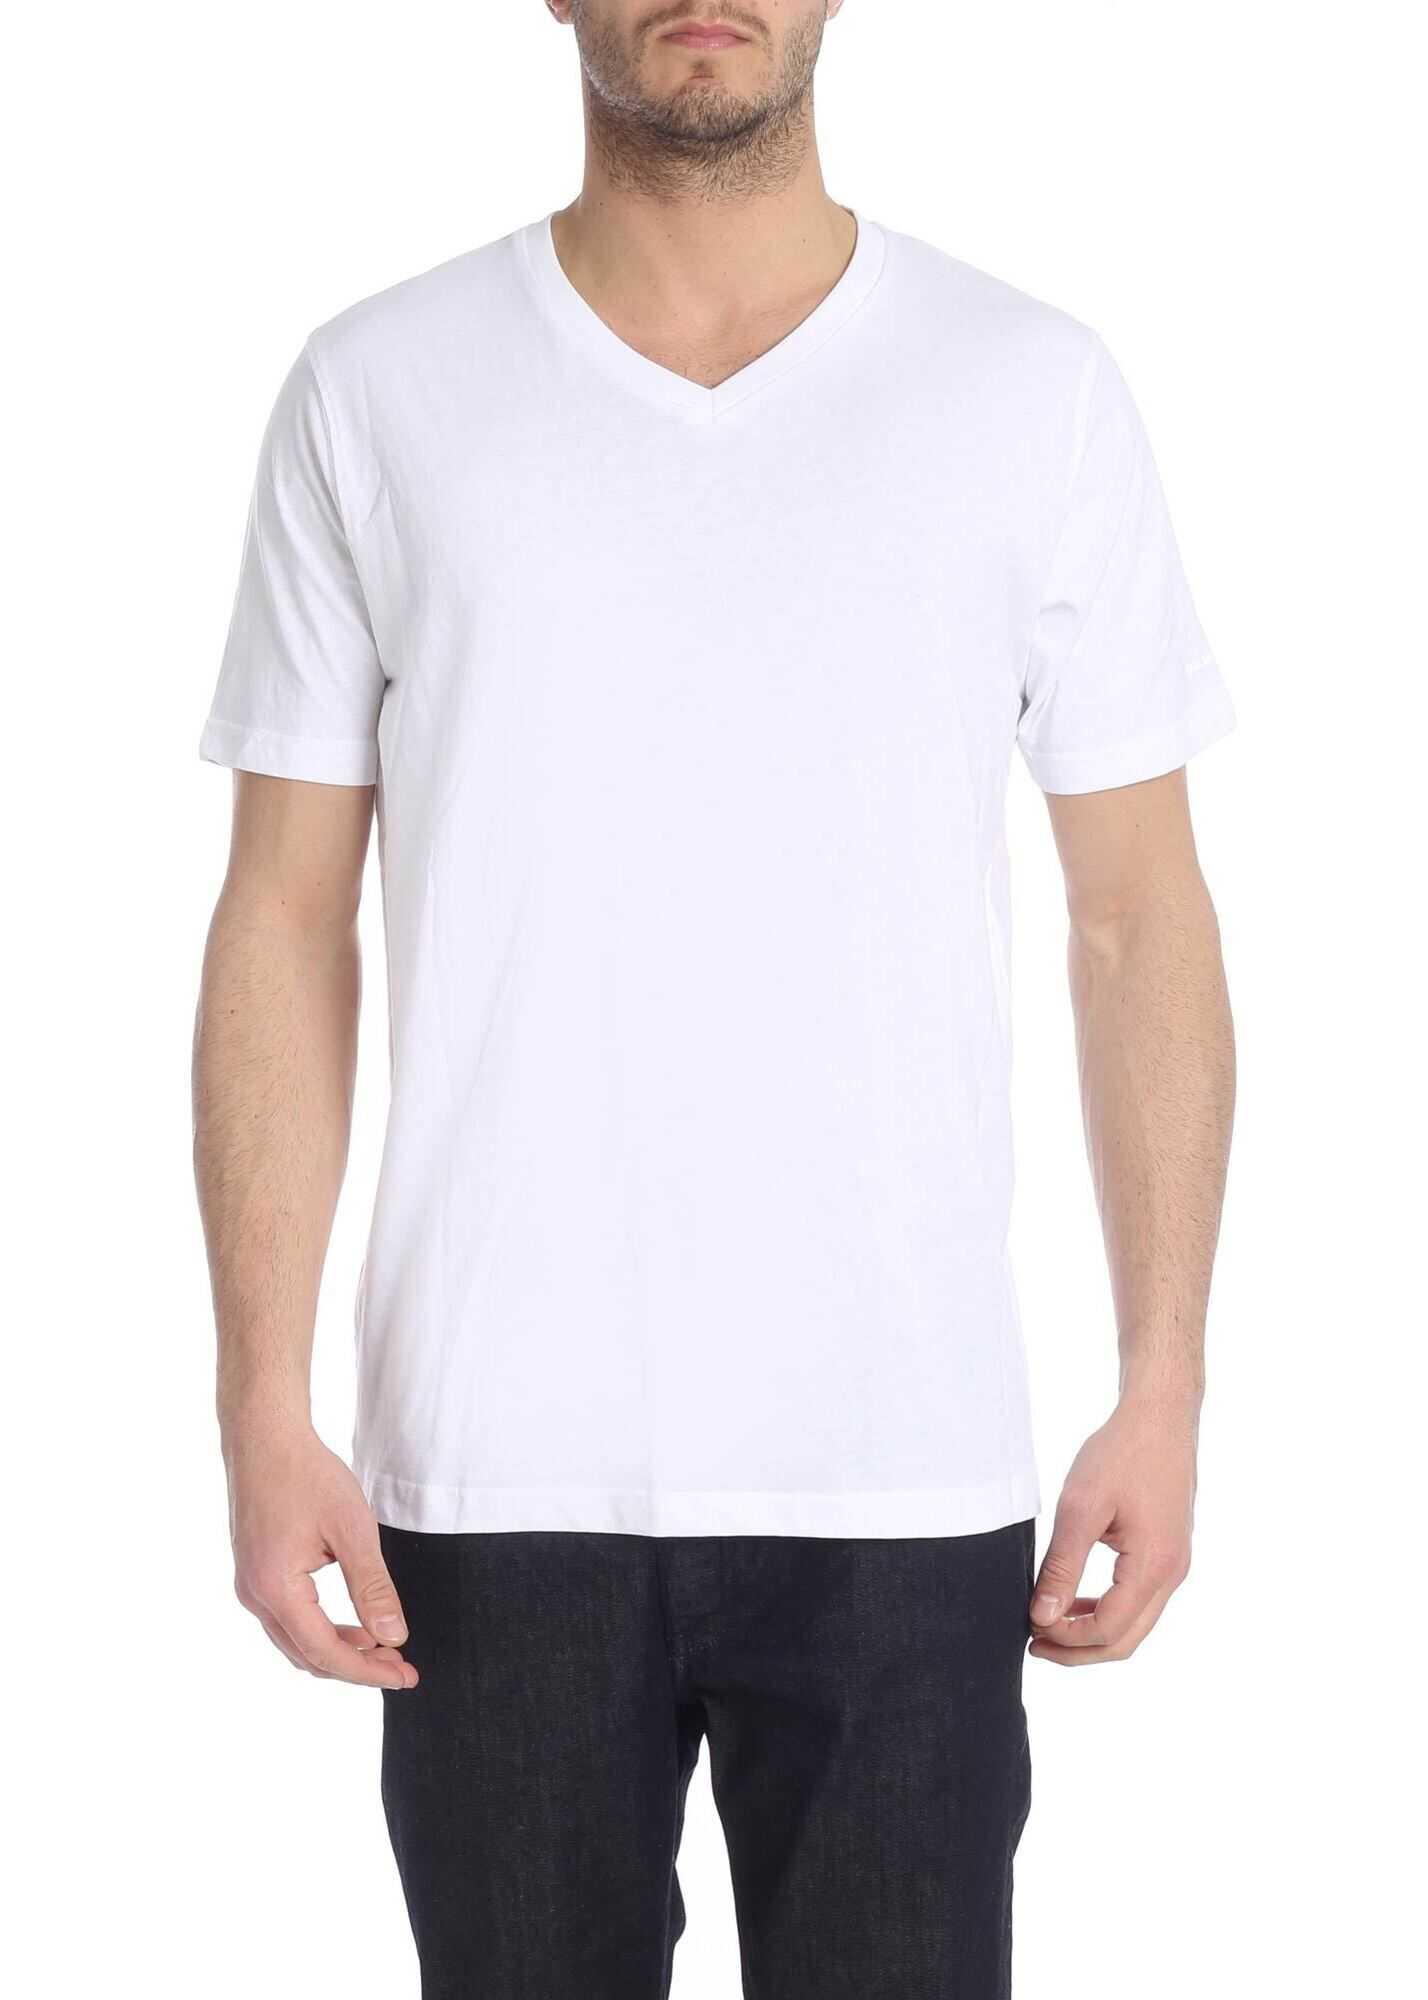 Set Of 2 White T-Shirts